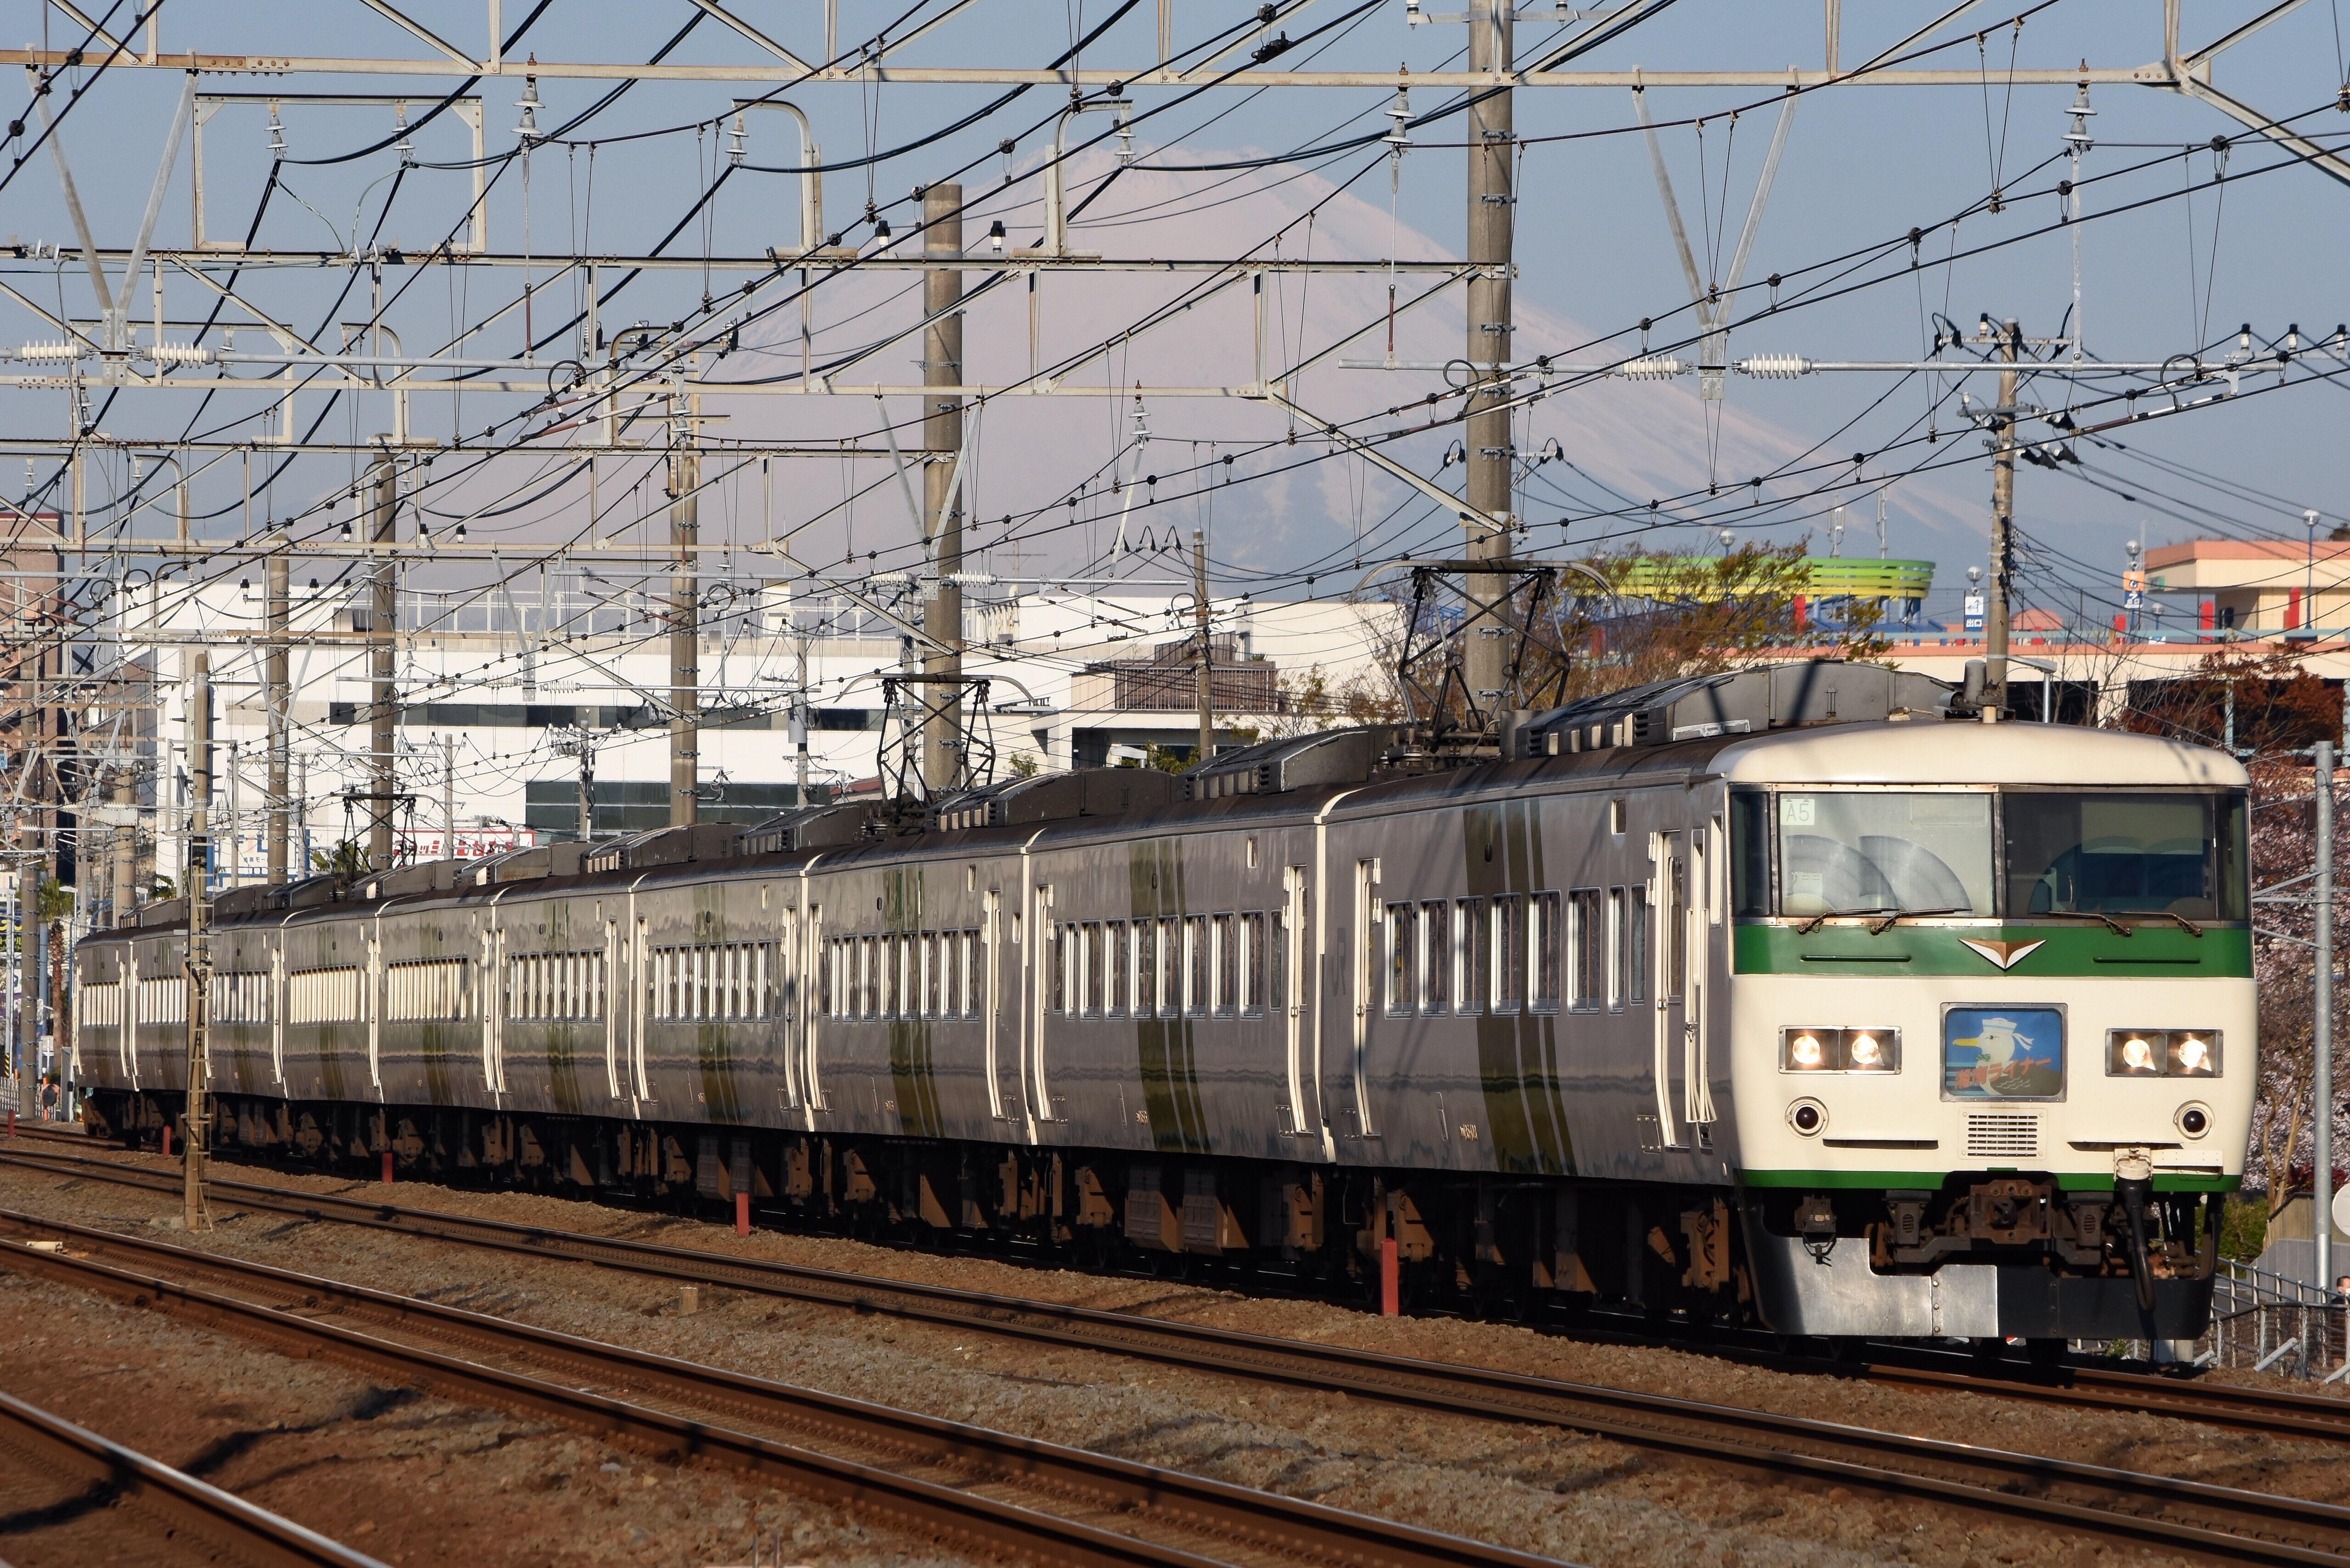 f:id:Nagaoka103:20190407161933j:image